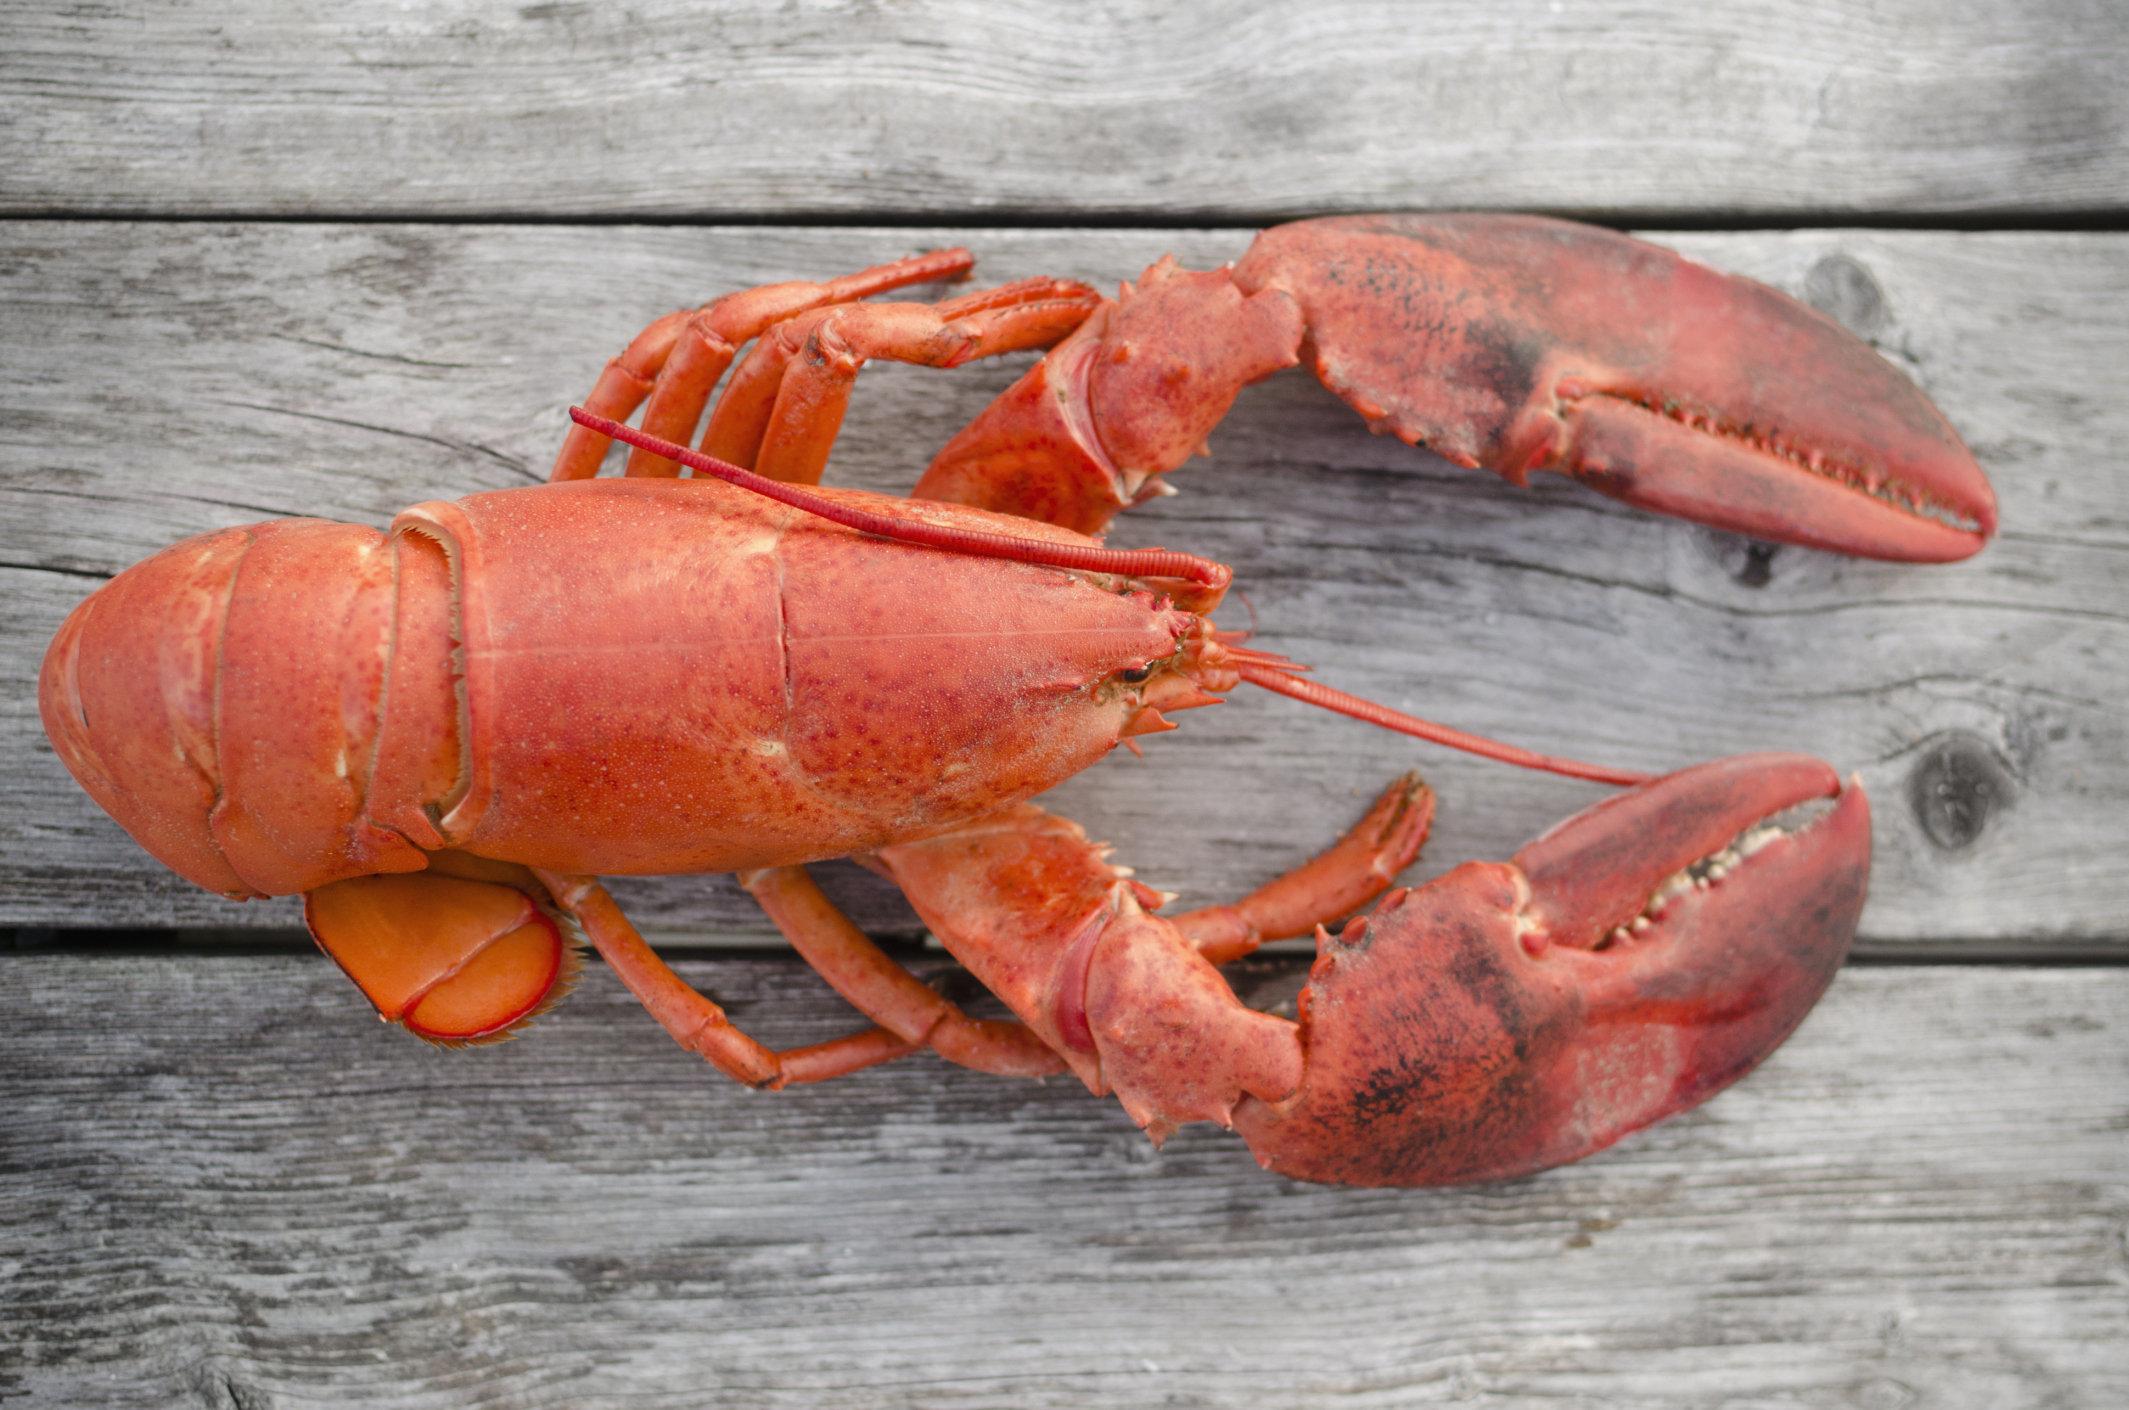 USA, Massachusetts, Plymouth, Raw lobster